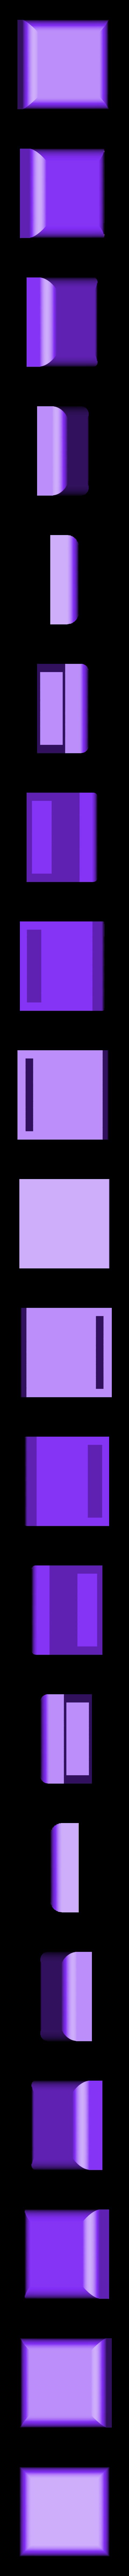 Square button.stl Download STL file One piece flexible magnetic purse • 3D printable object, Aravon